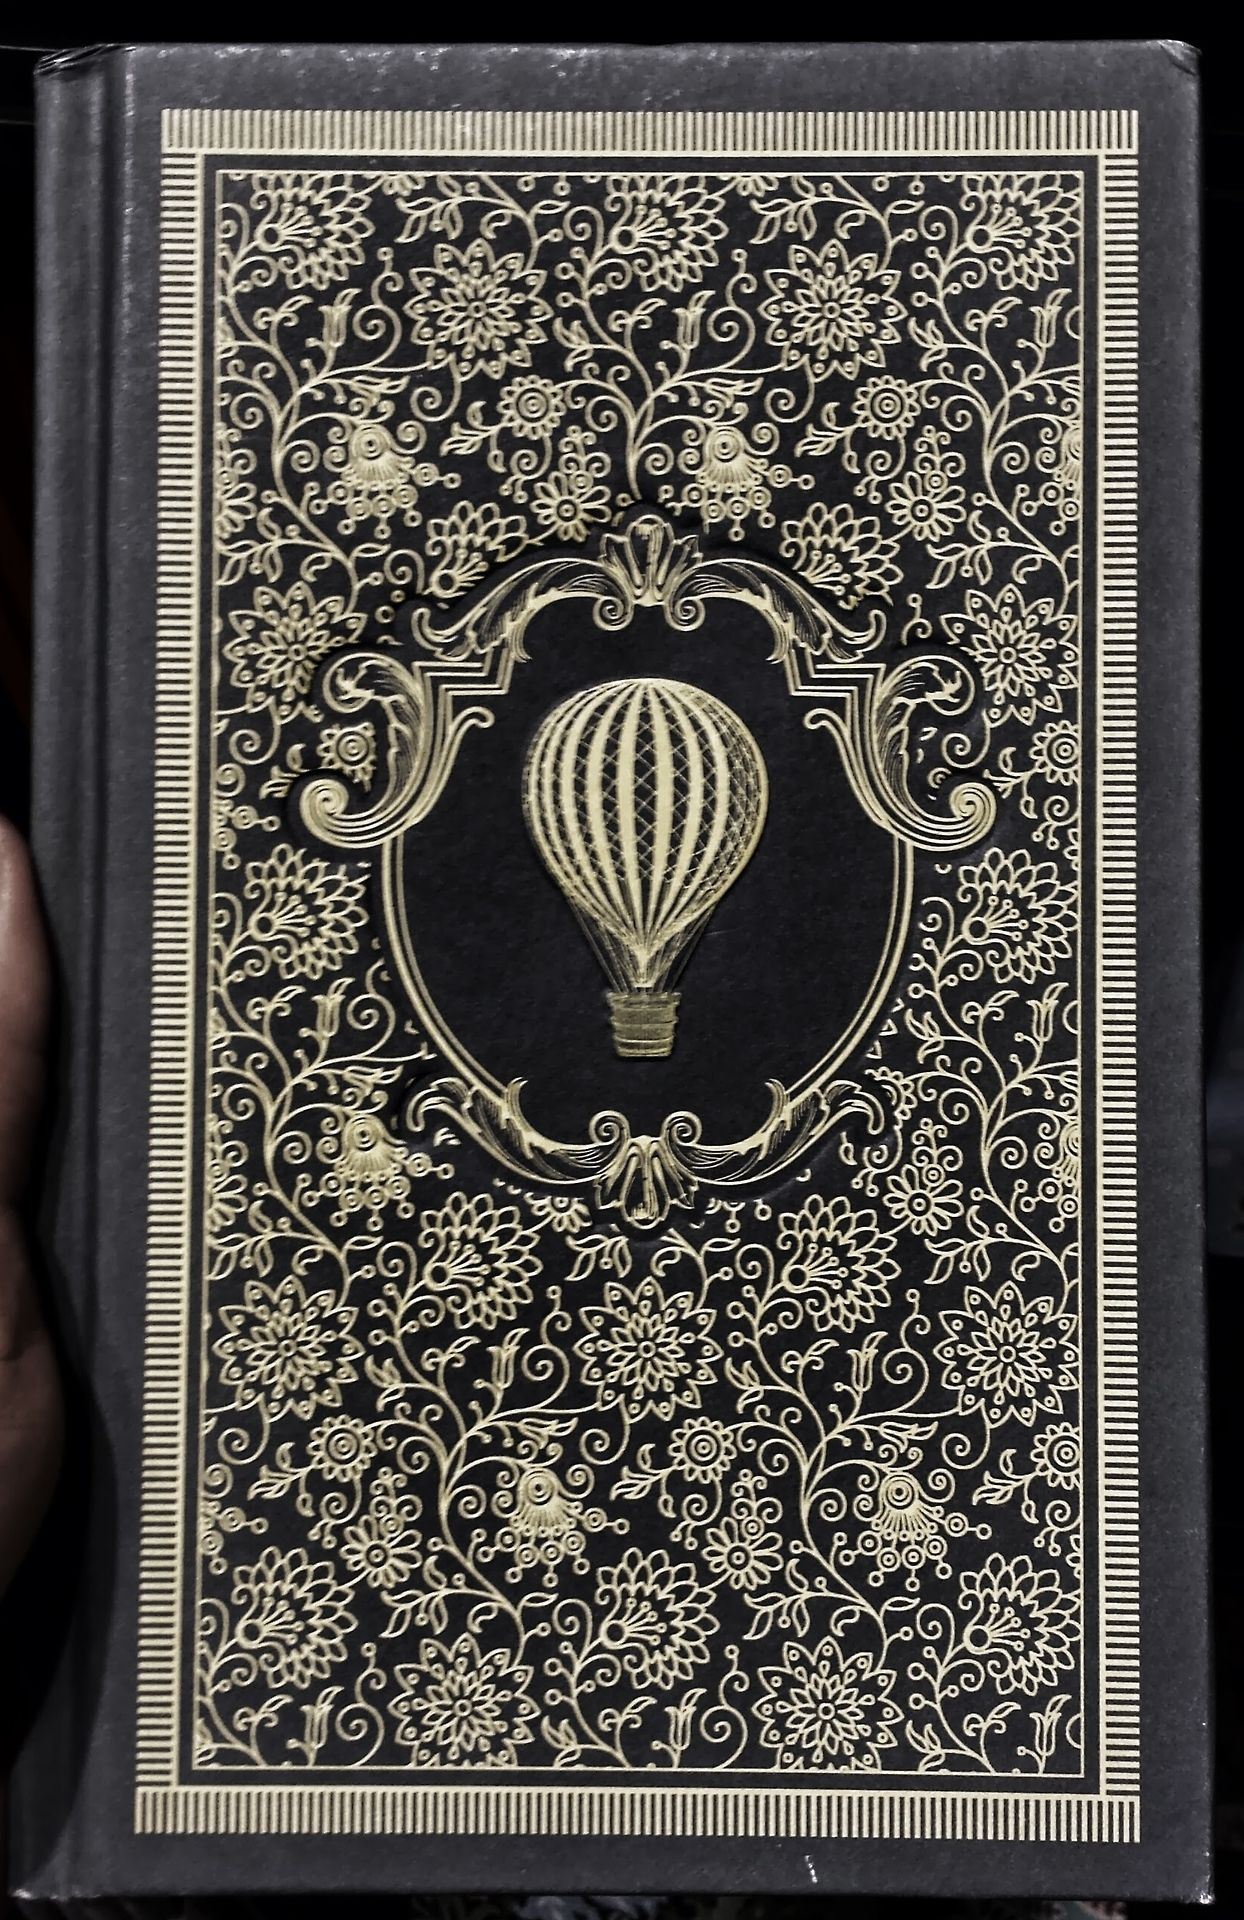 Notebook from Waterstones.